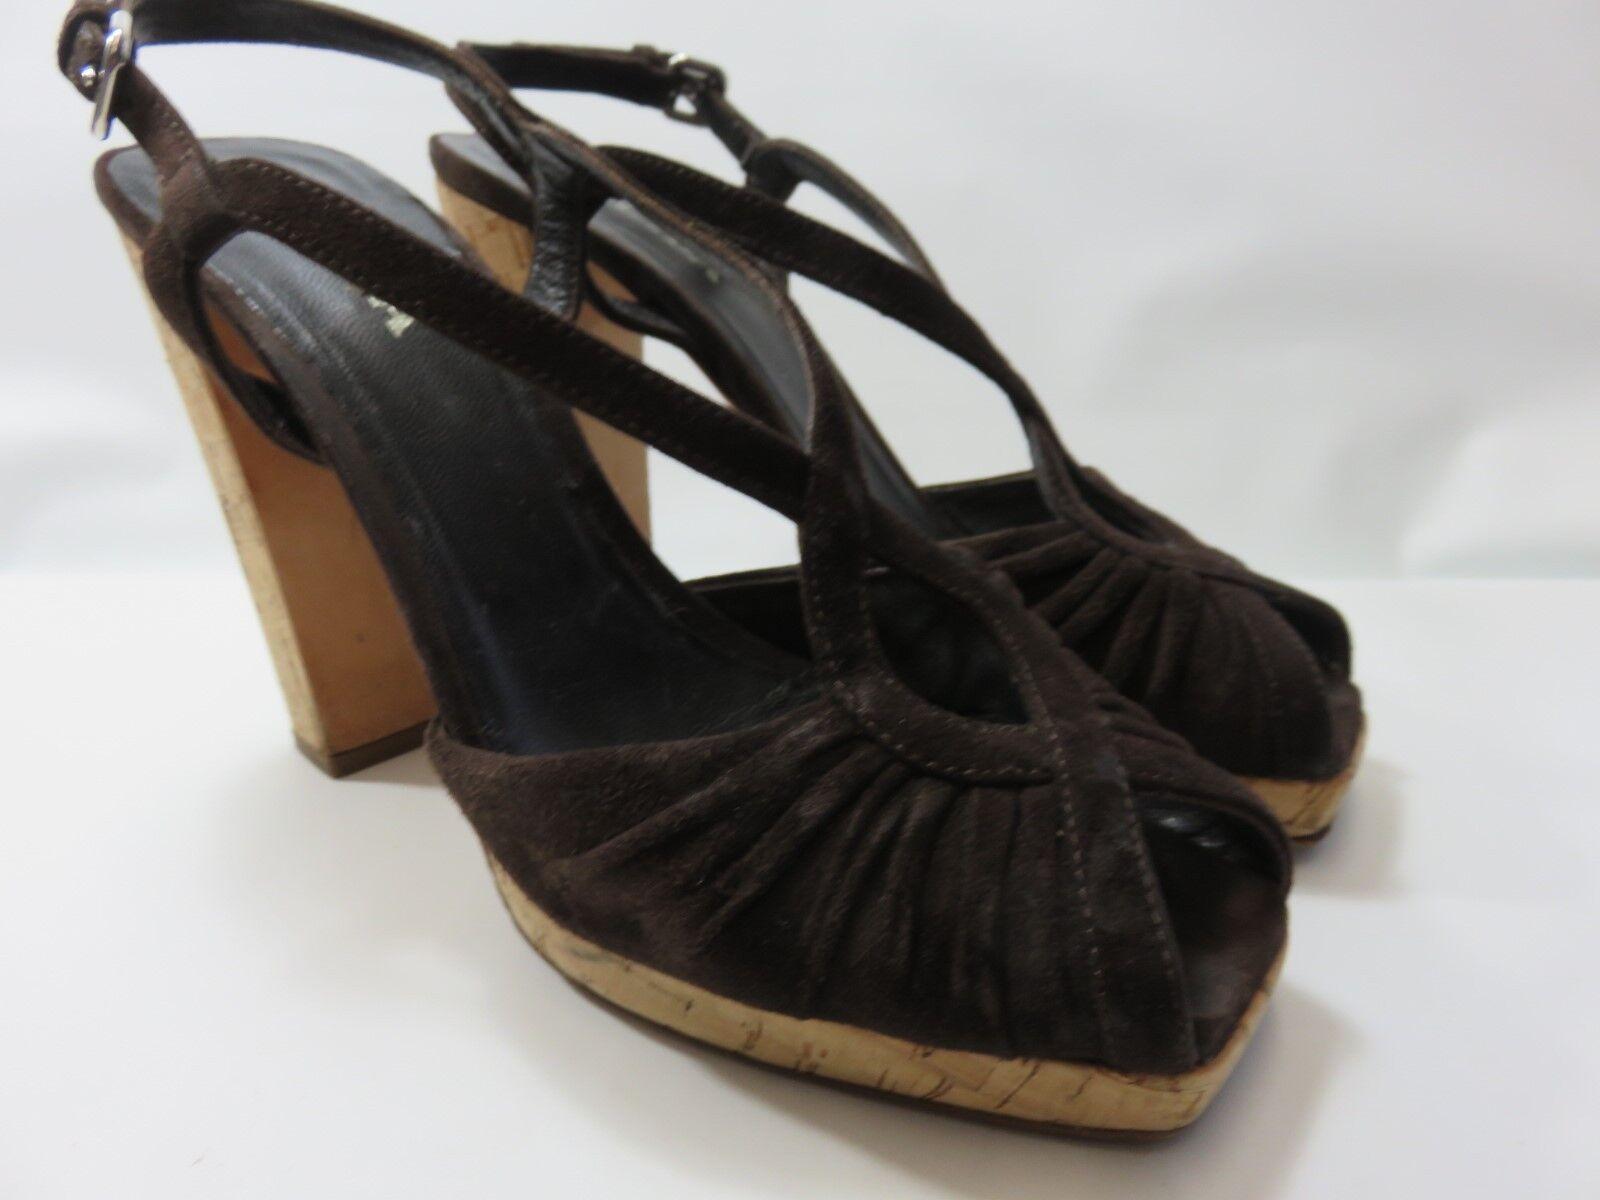 PRADA Brown Suede Strappy Heels Women's Size 39 Medium EUC  MADE IN ITALY